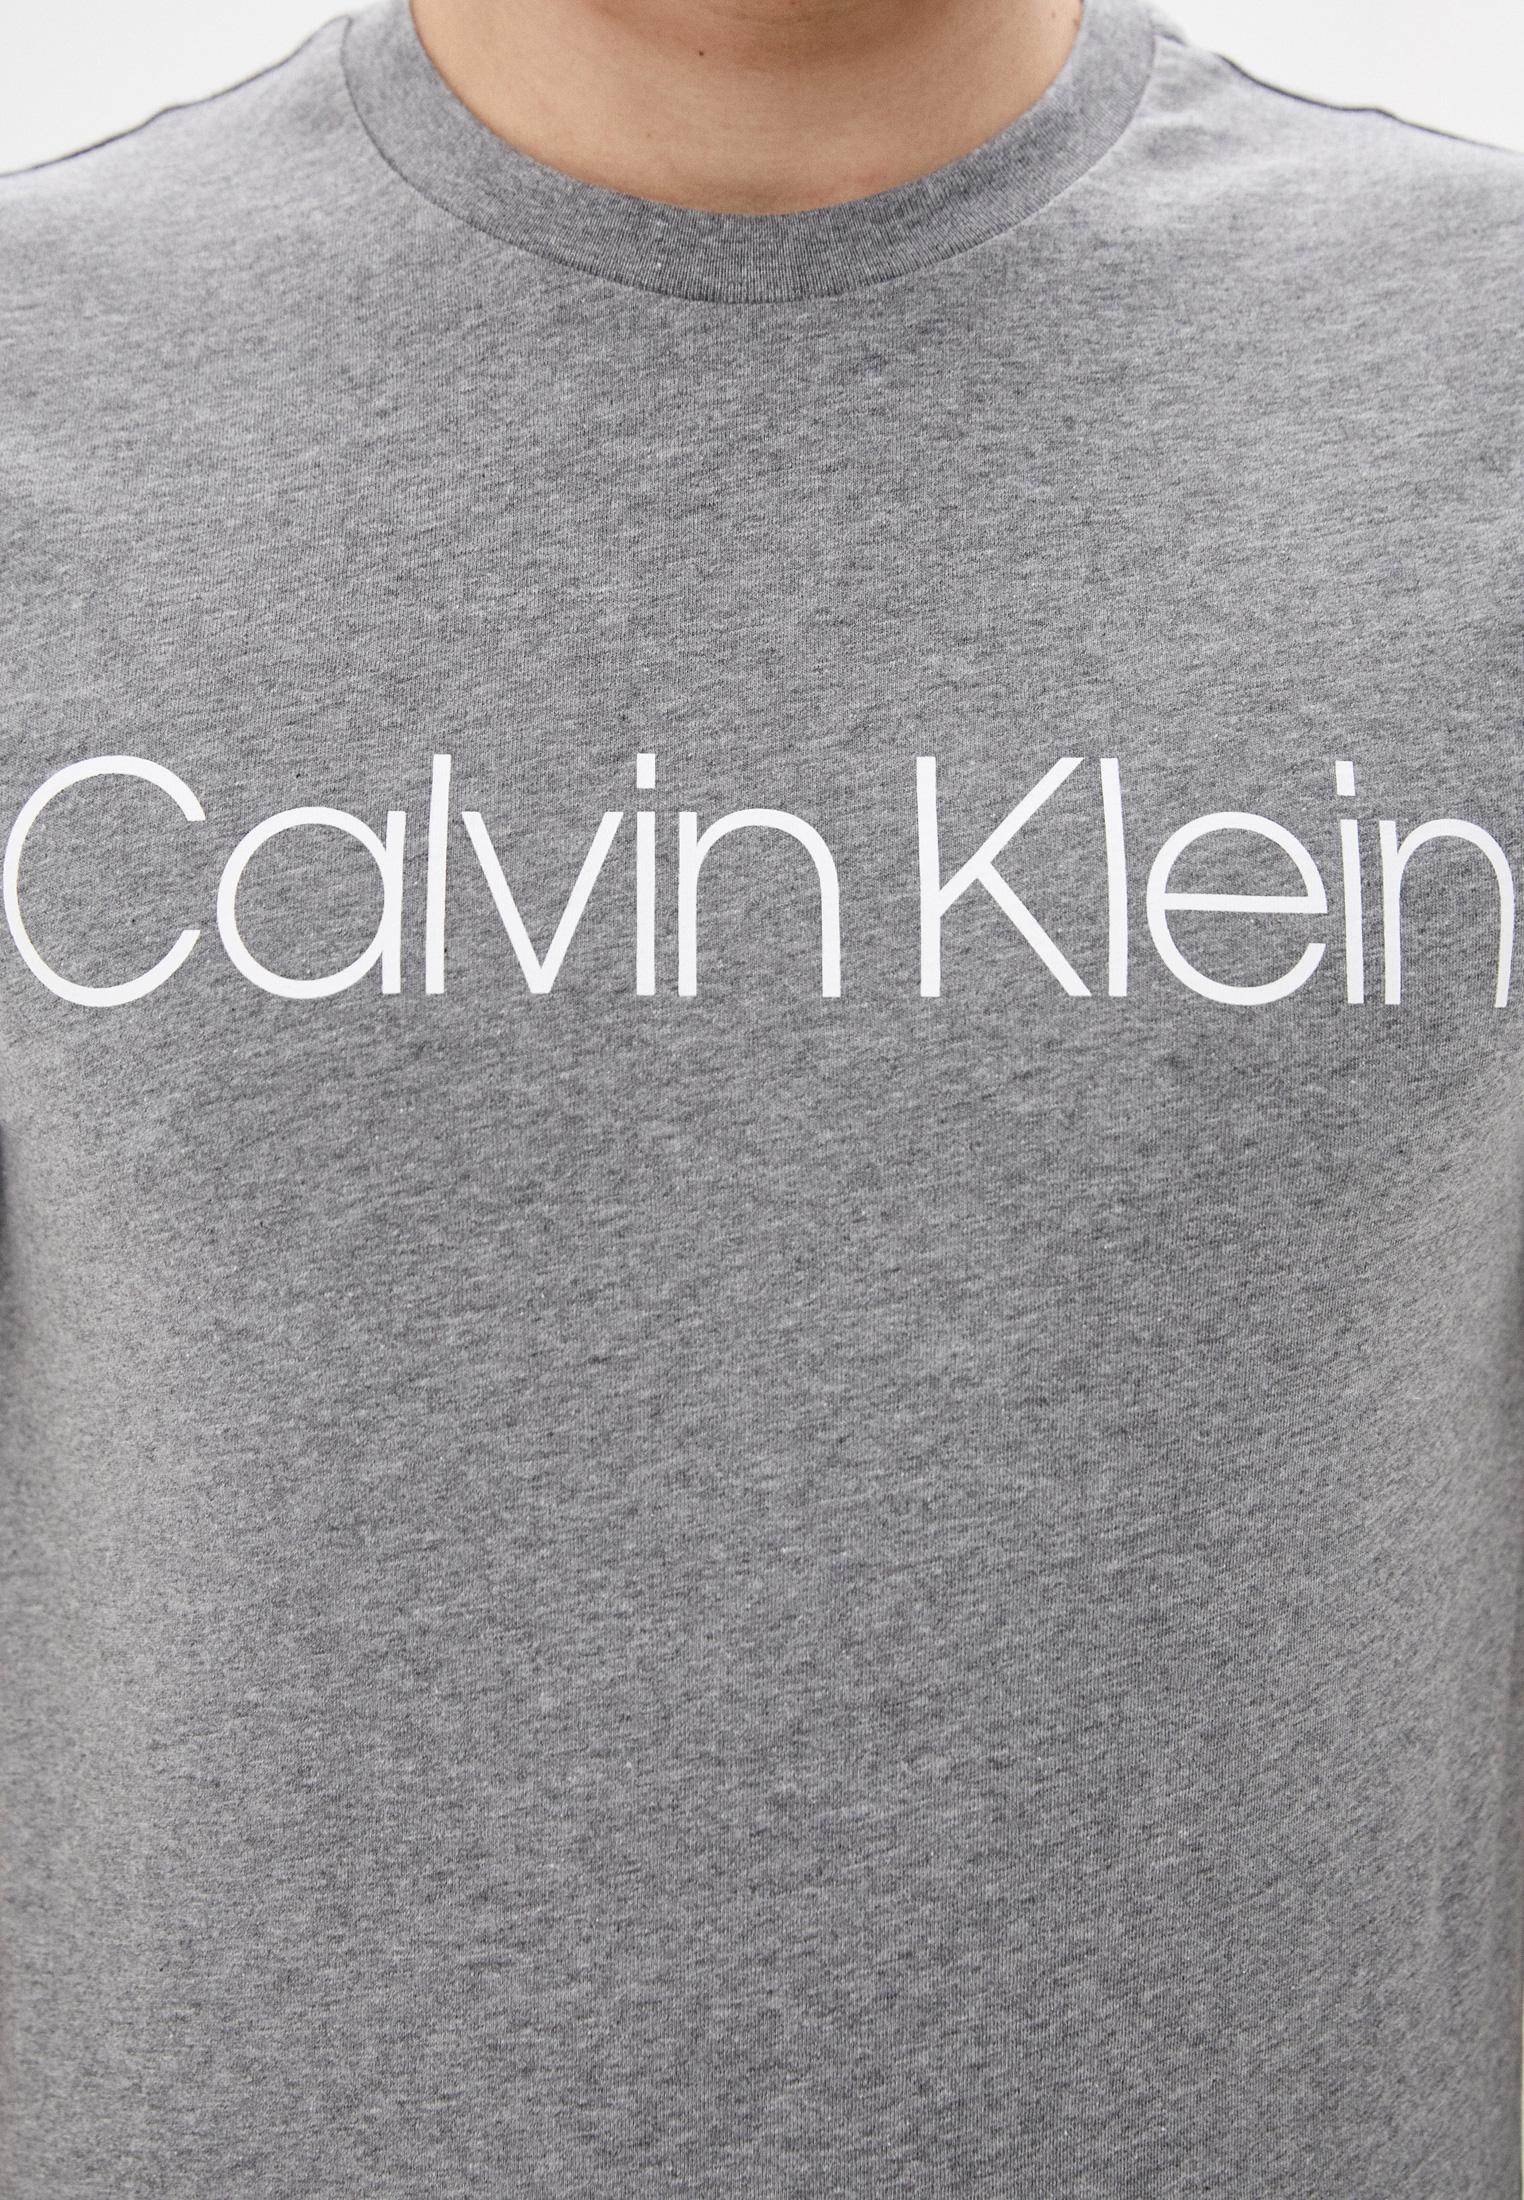 Футболка Calvin Klein (Кельвин Кляйн) K10K104063: изображение 4